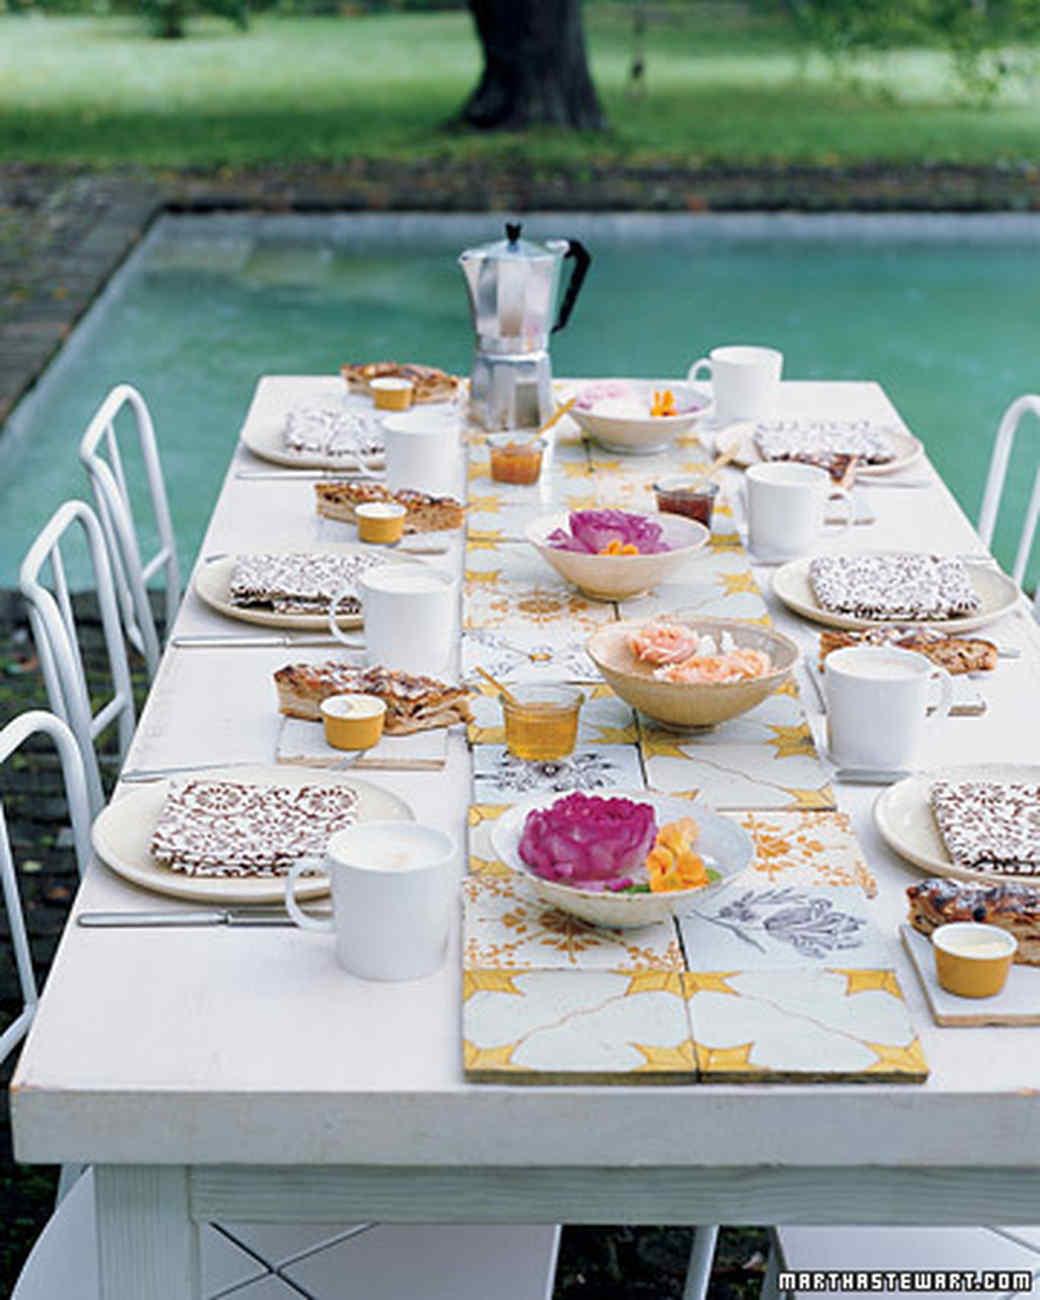 garden party ideas martha stewart - Garden Party Ideas